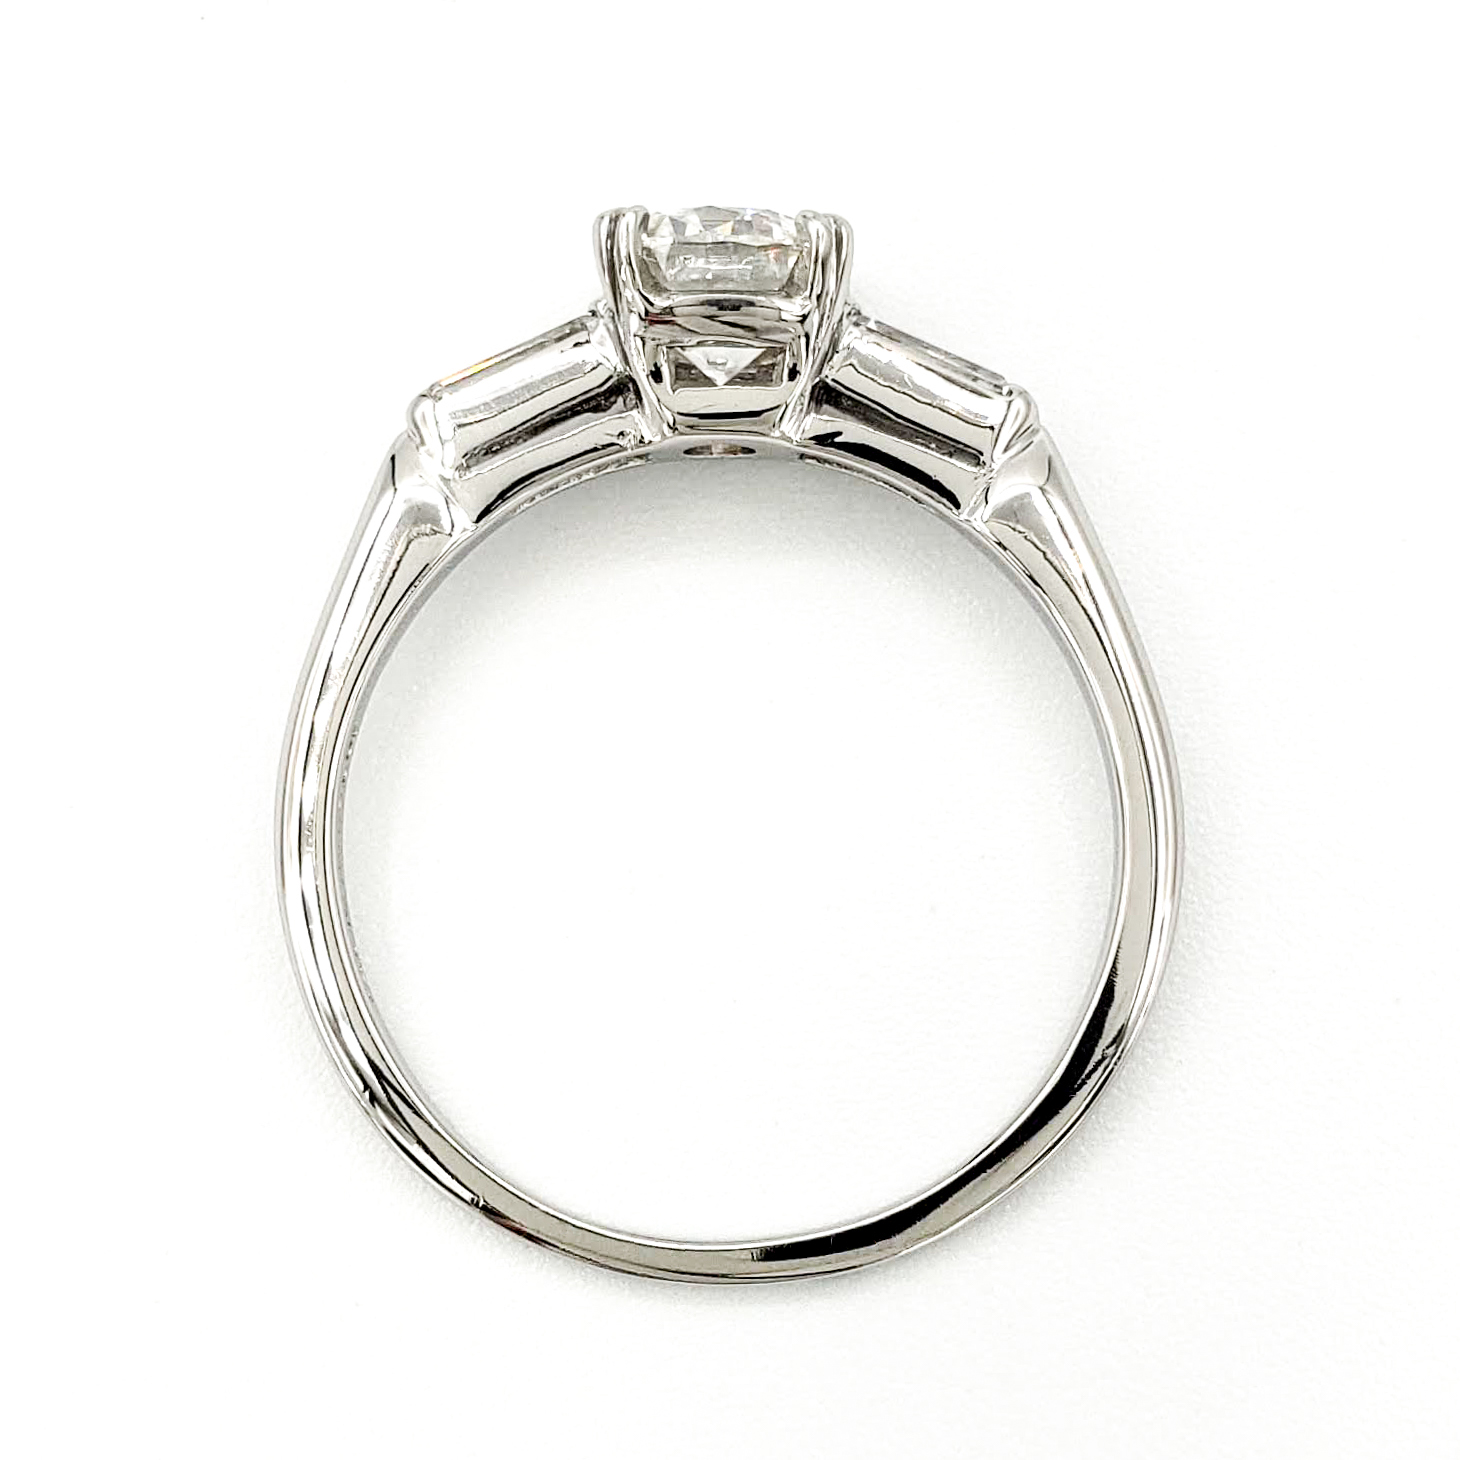 vintage-platinum-engagement-ring-with-0-91-carat-round-brilliant-cut-diamond-gia-e-vs1